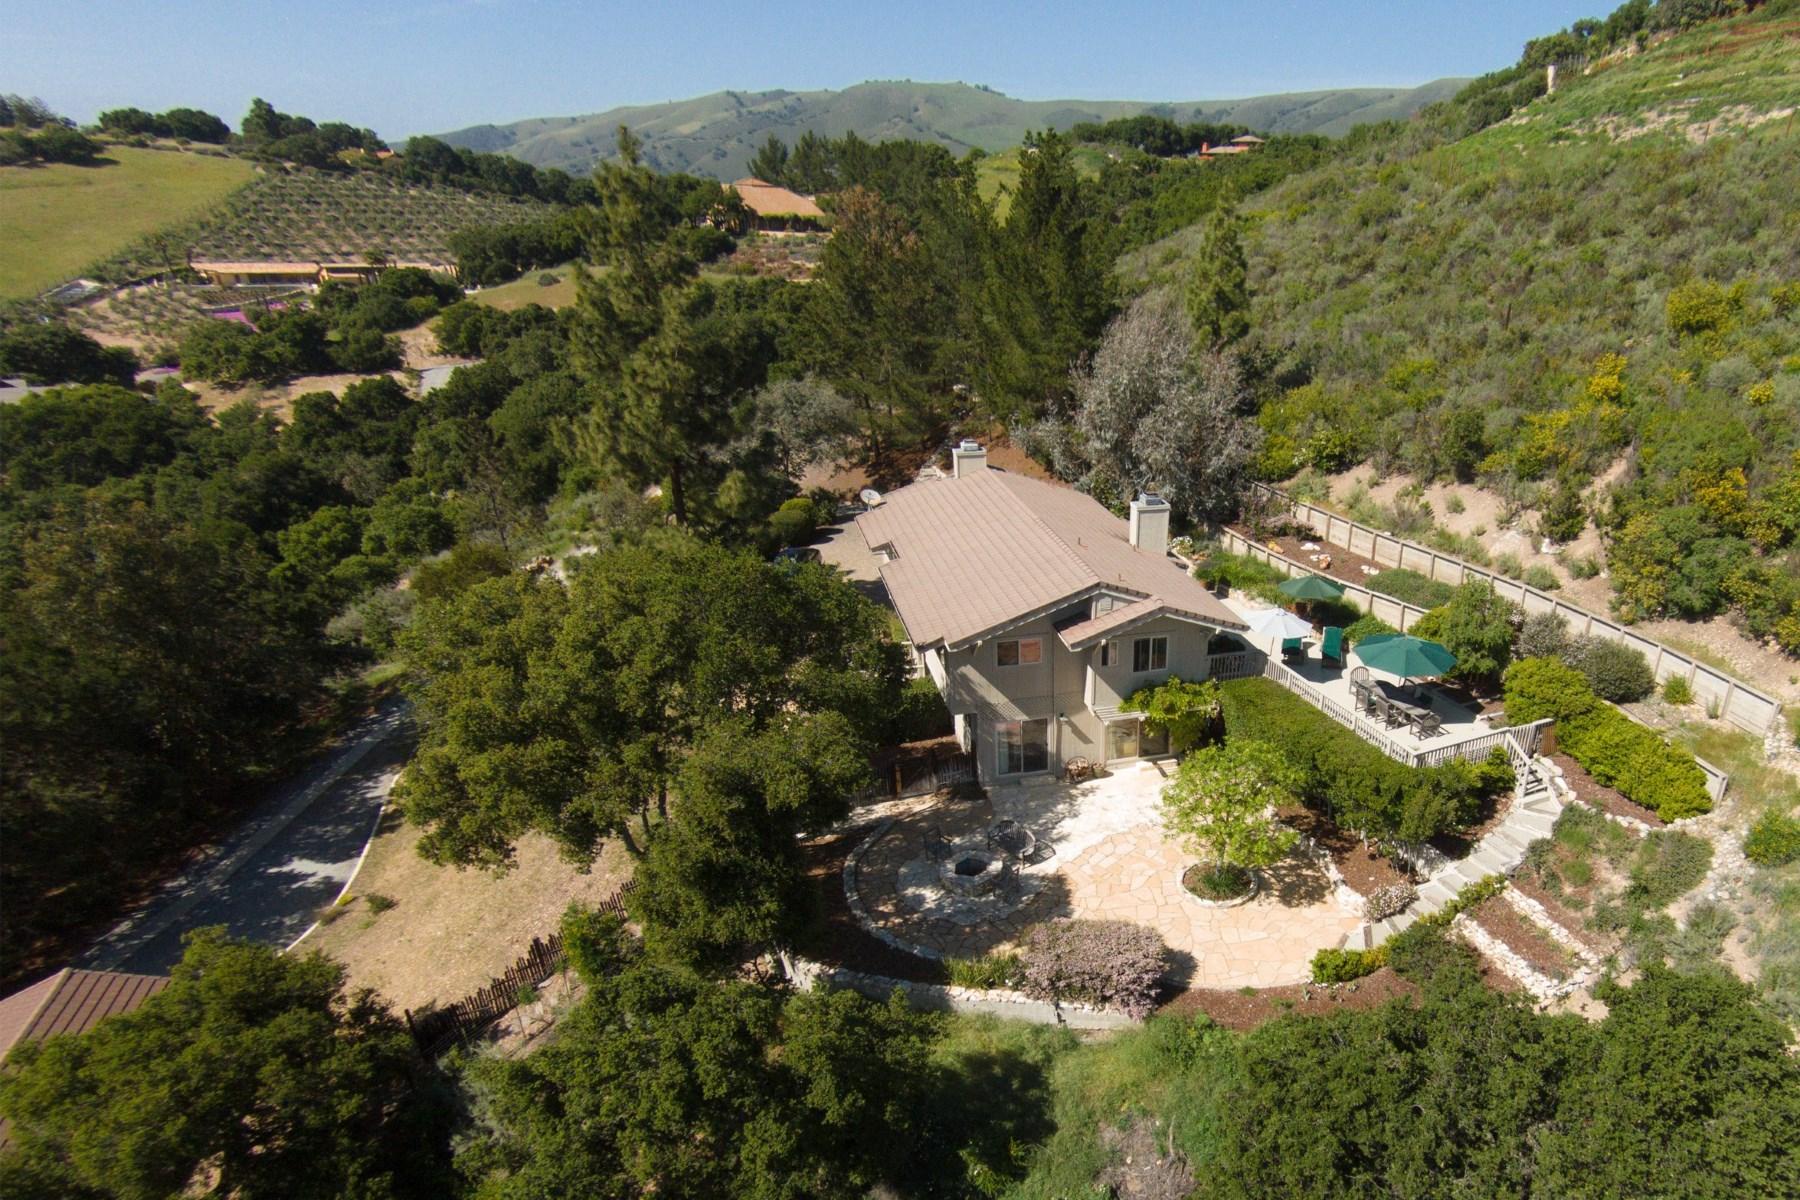 Single Family Home for Sale at Vista Montaña 31475 Via Las Rosas Carmel Valley, California, 93924 United States